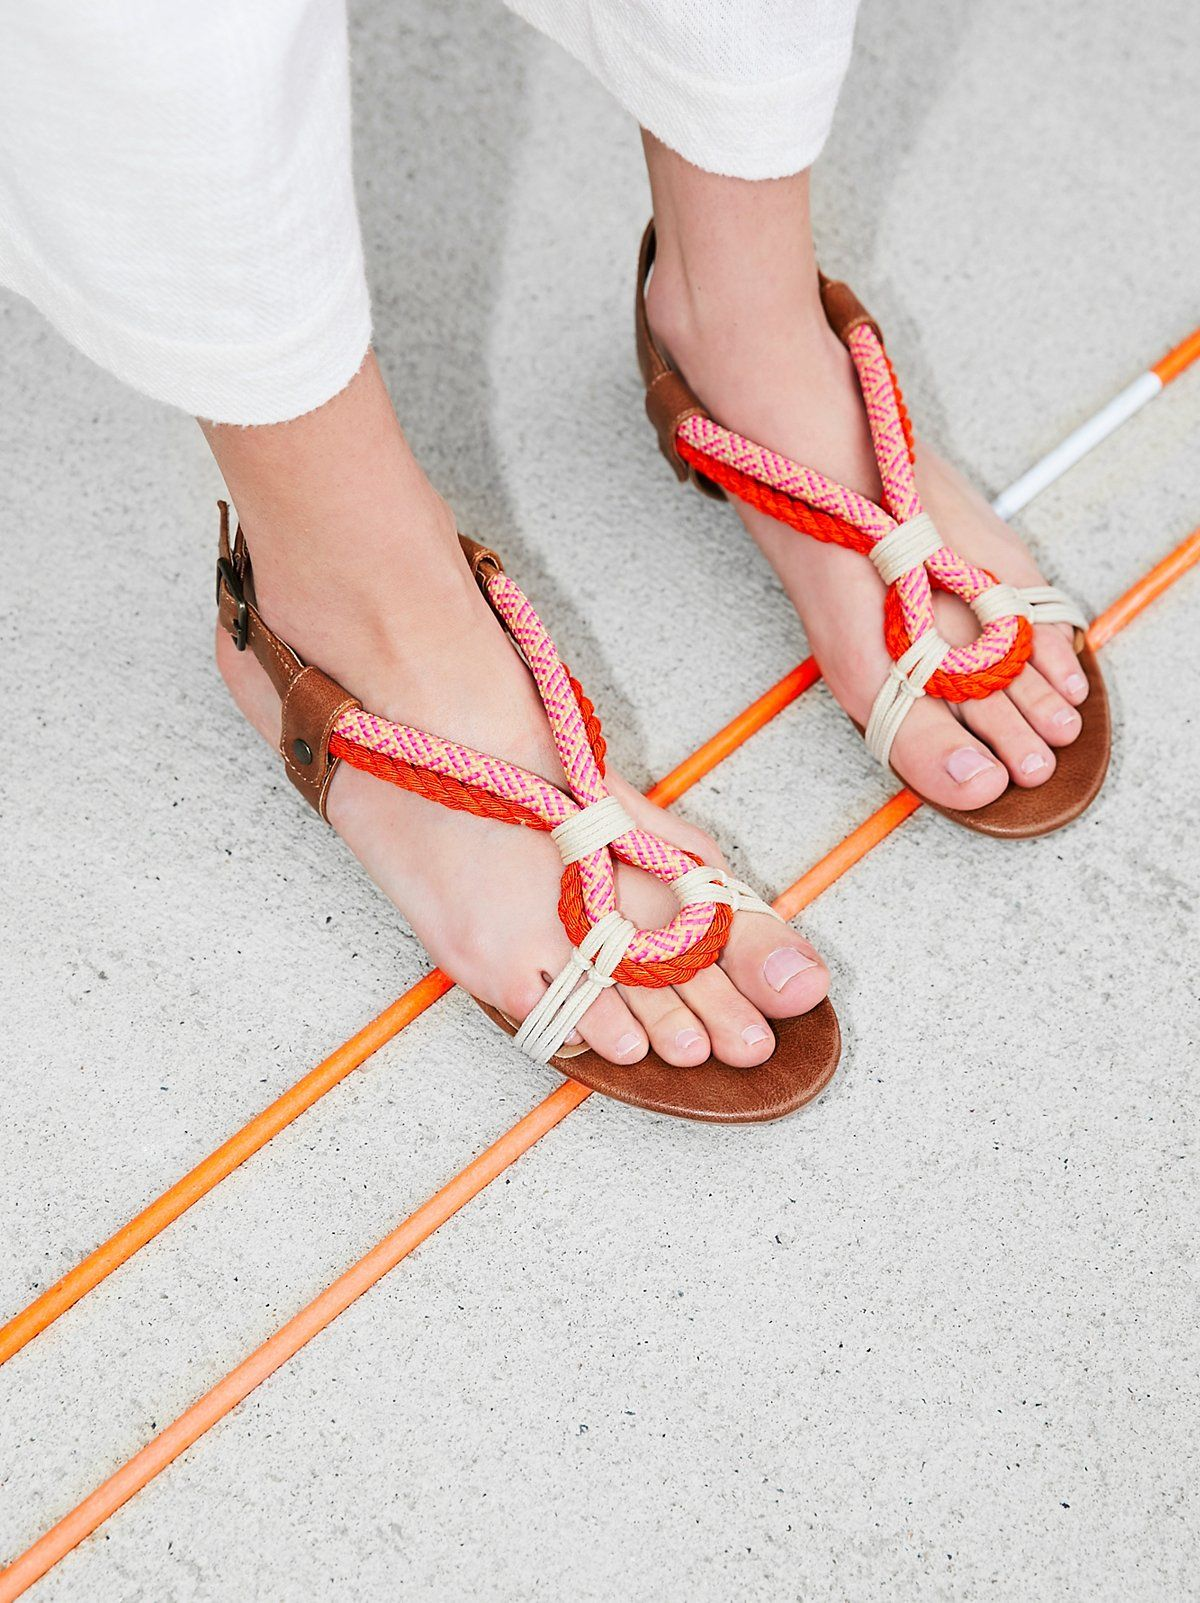 Tucson Rope Sandal Rope Sandals Strap Heels Sandals